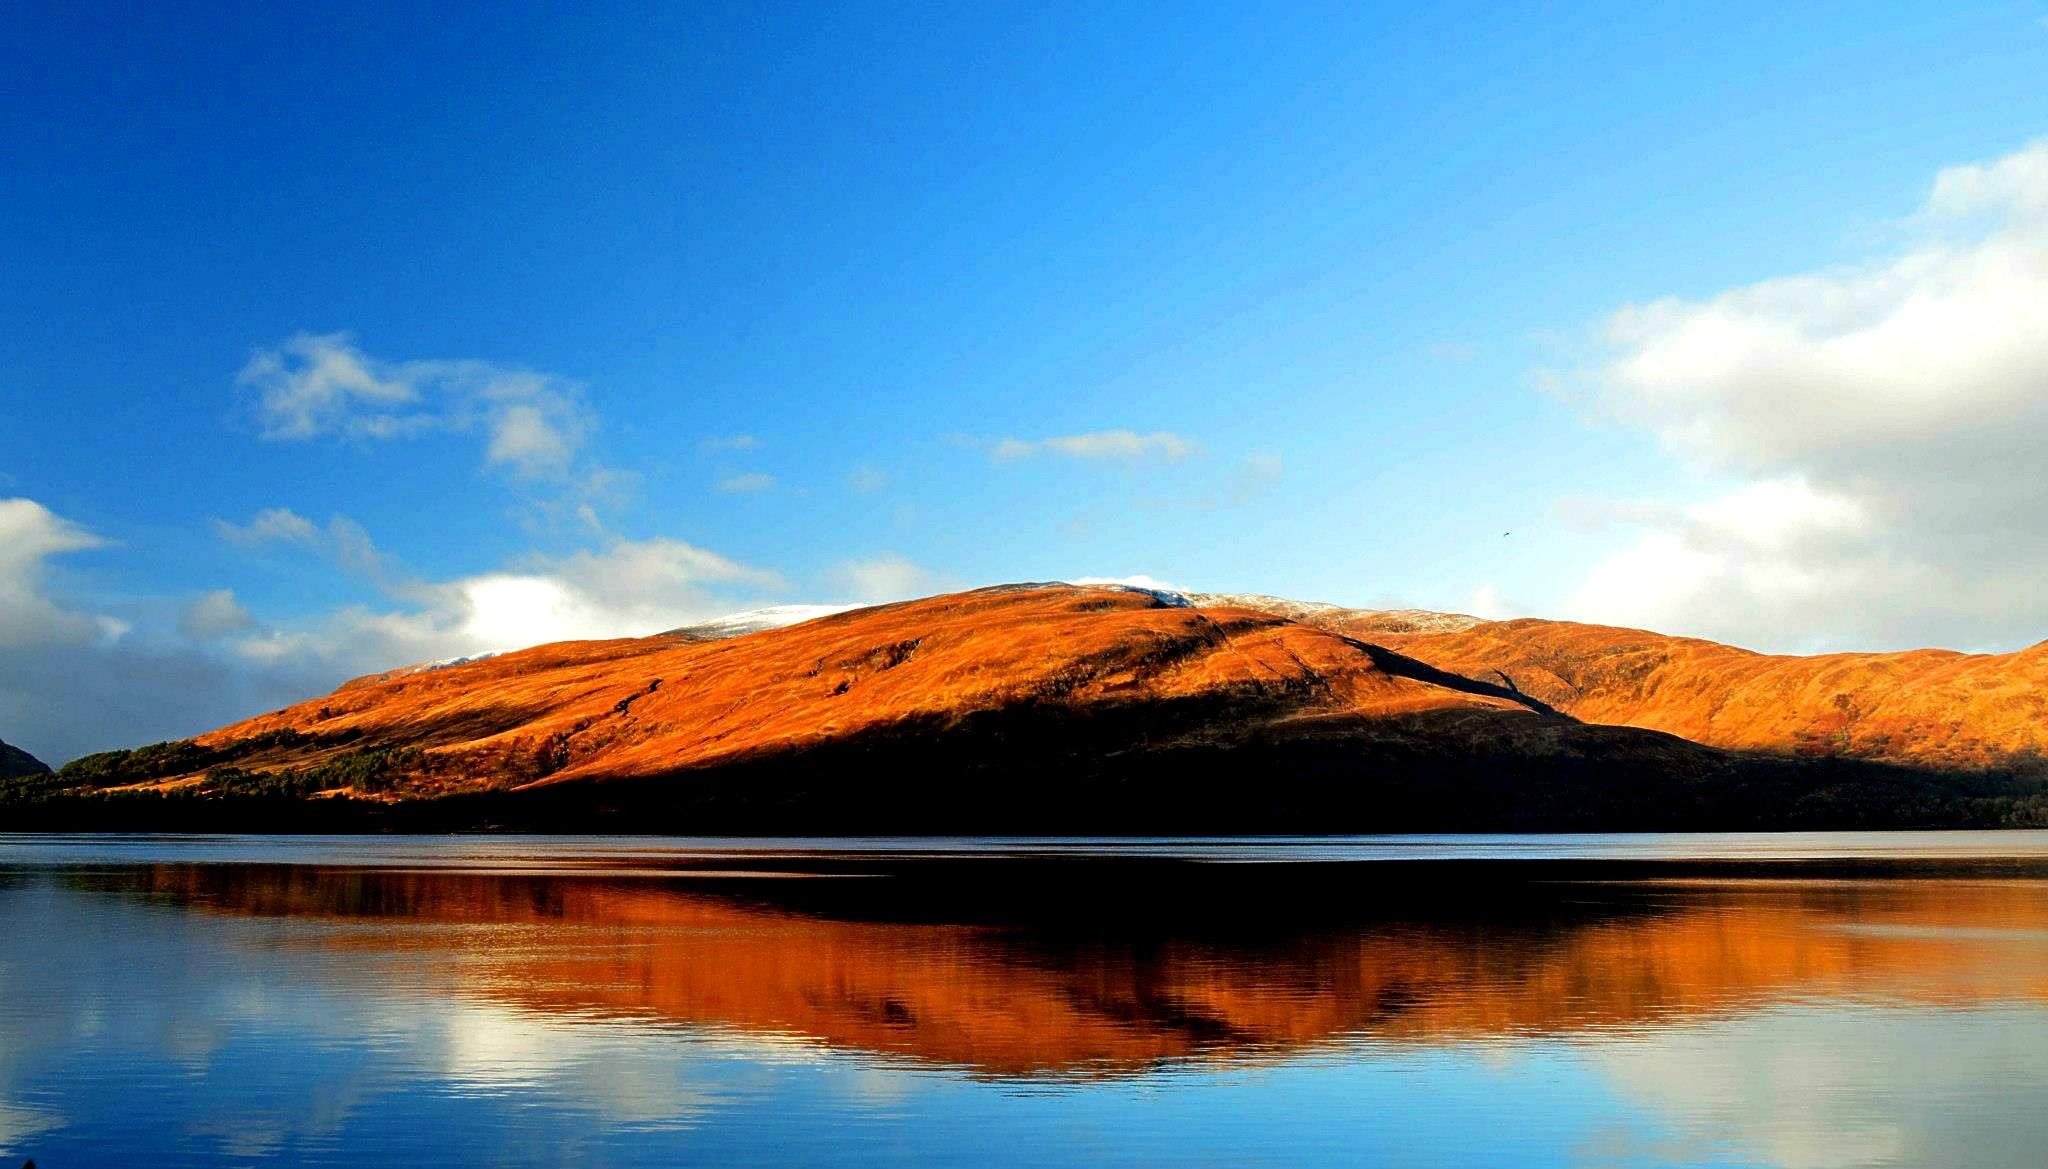 Loch Morar, Scotland by Nik On Landscapes